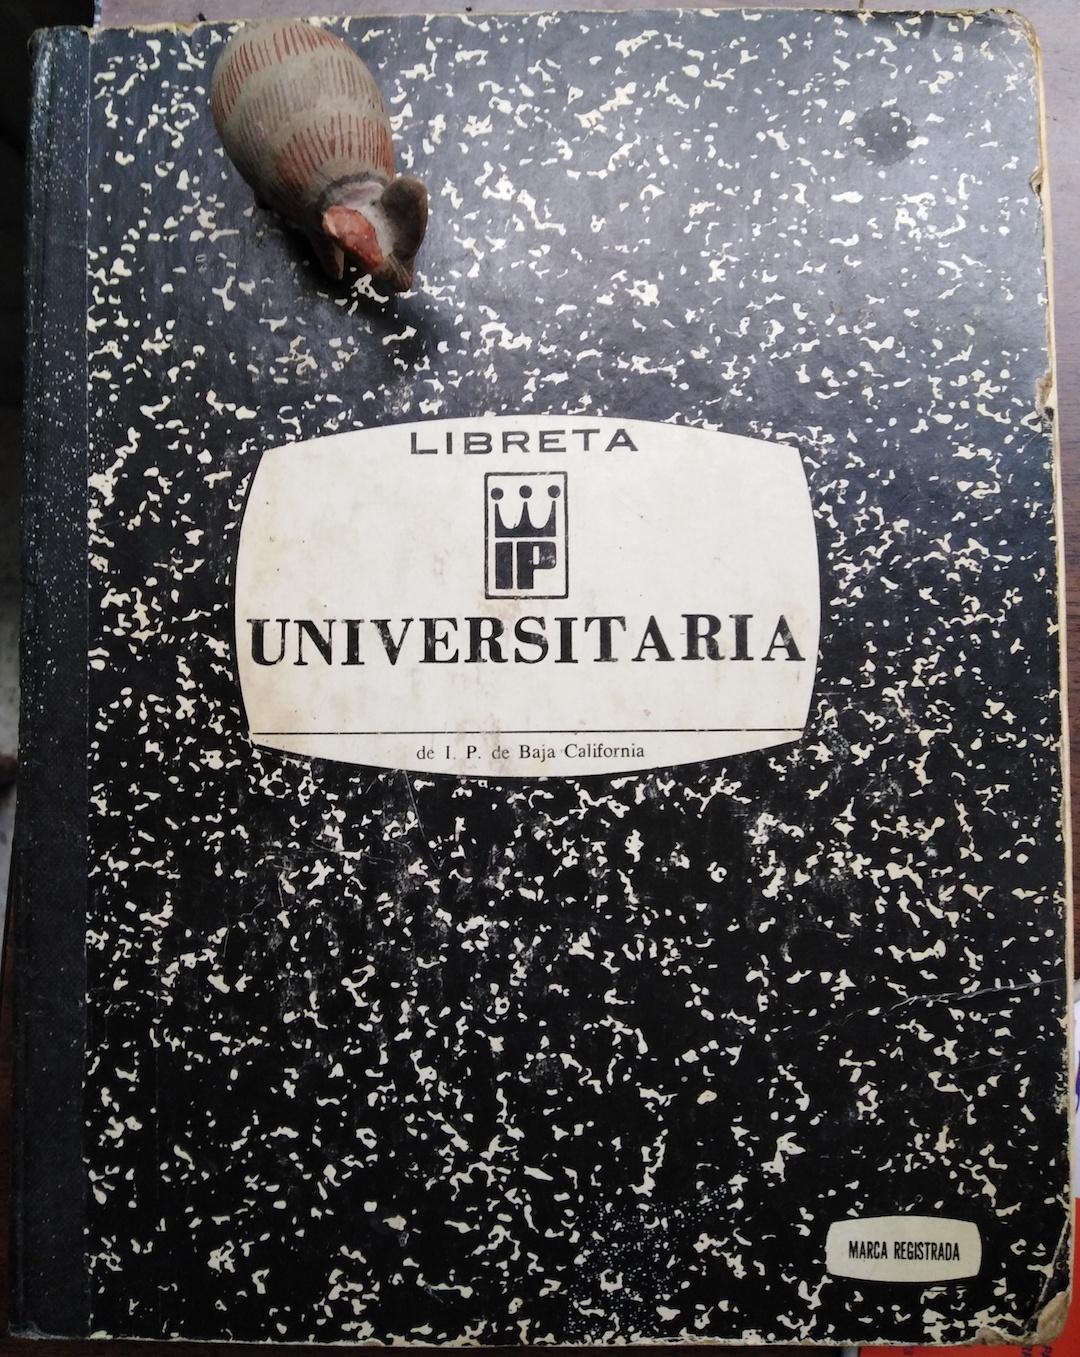 08122018_fondatransito-recetario libreta.jpg